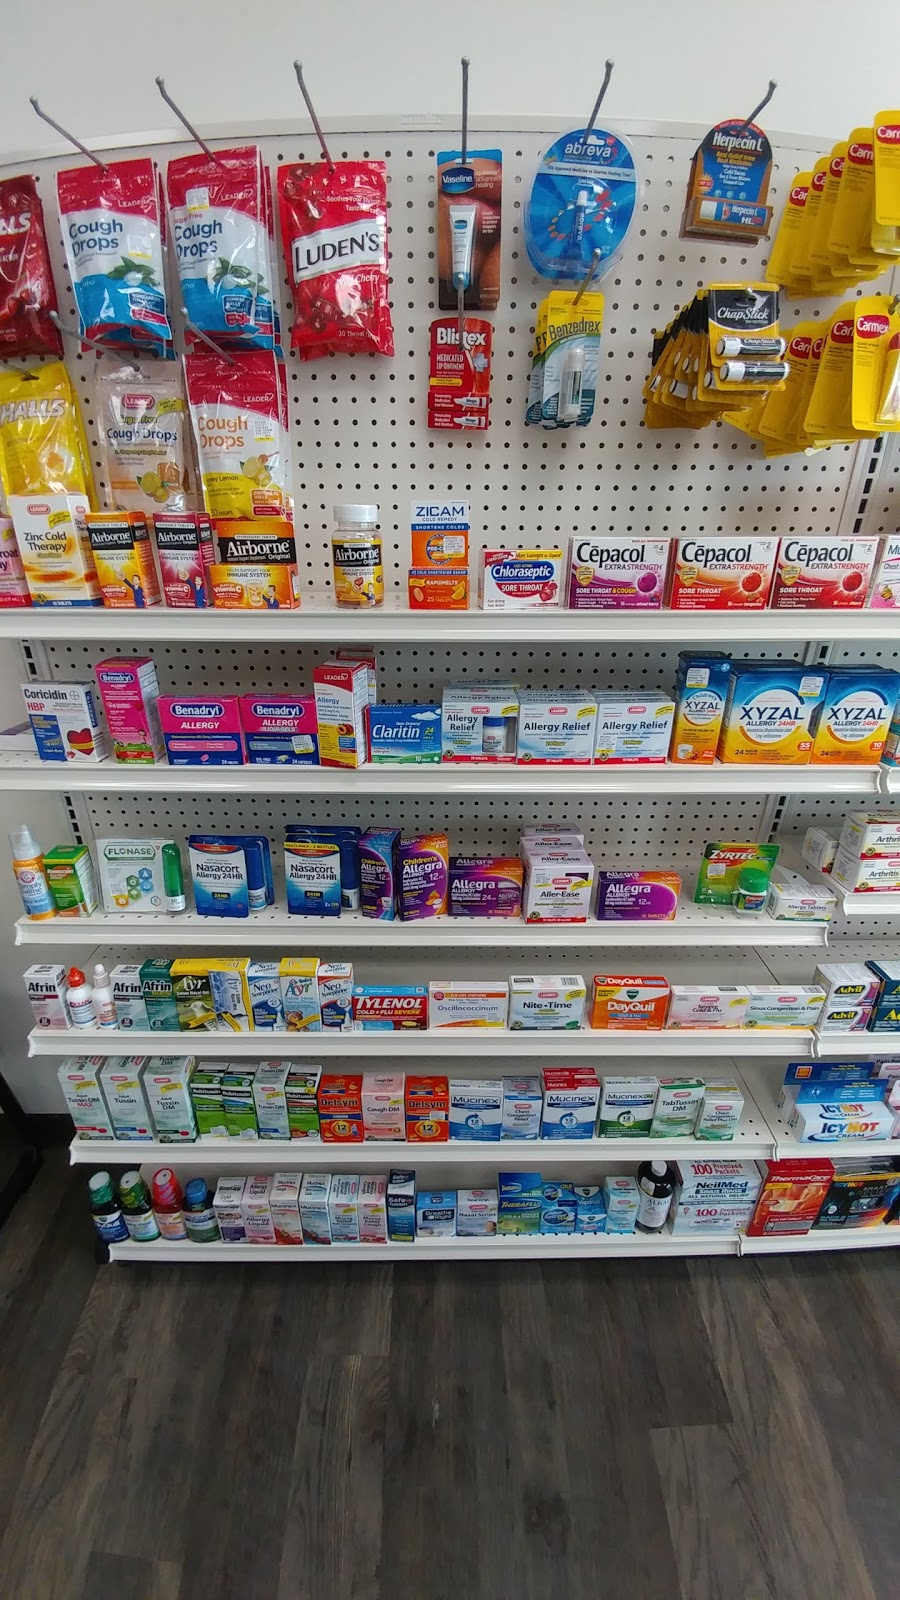 Frisco Pharmacy - pharmacy  | Photo 10 of 10 | Address: 14550 TX-121 STE 150, Frisco, TX 75035, USA | Phone: (469) 305-7058